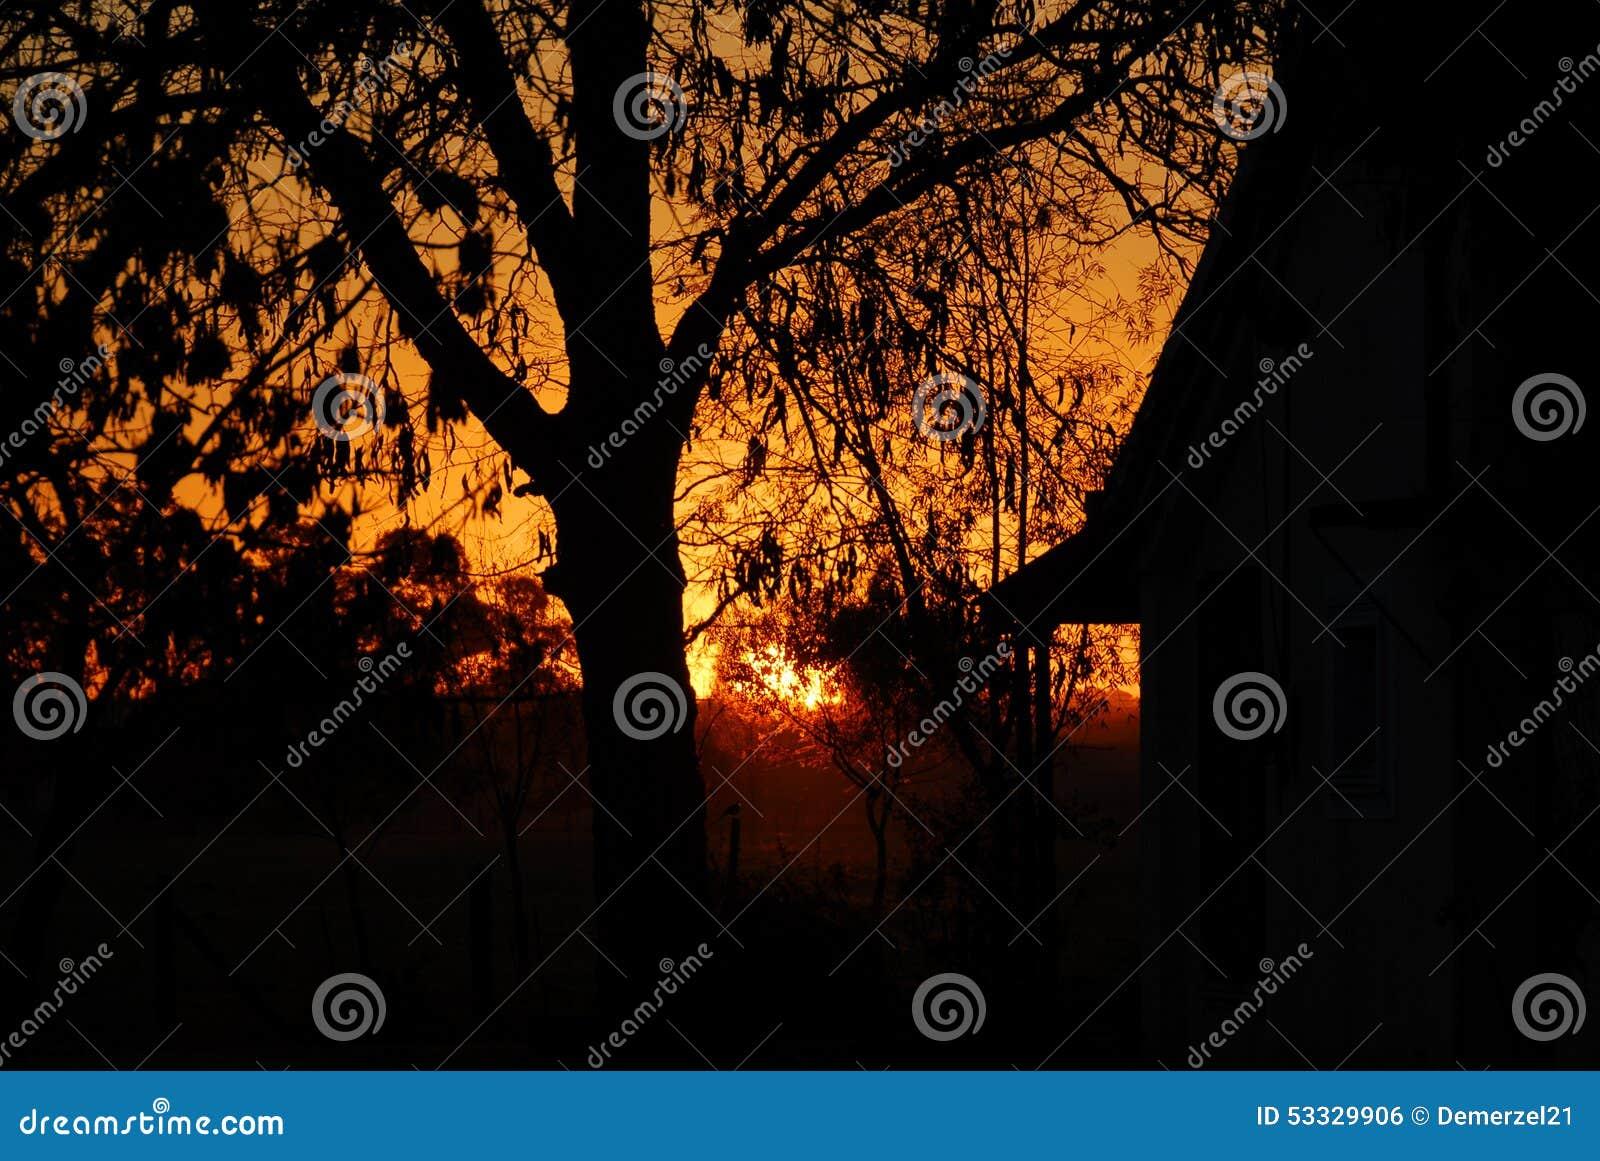 Solnedgång över en ranch